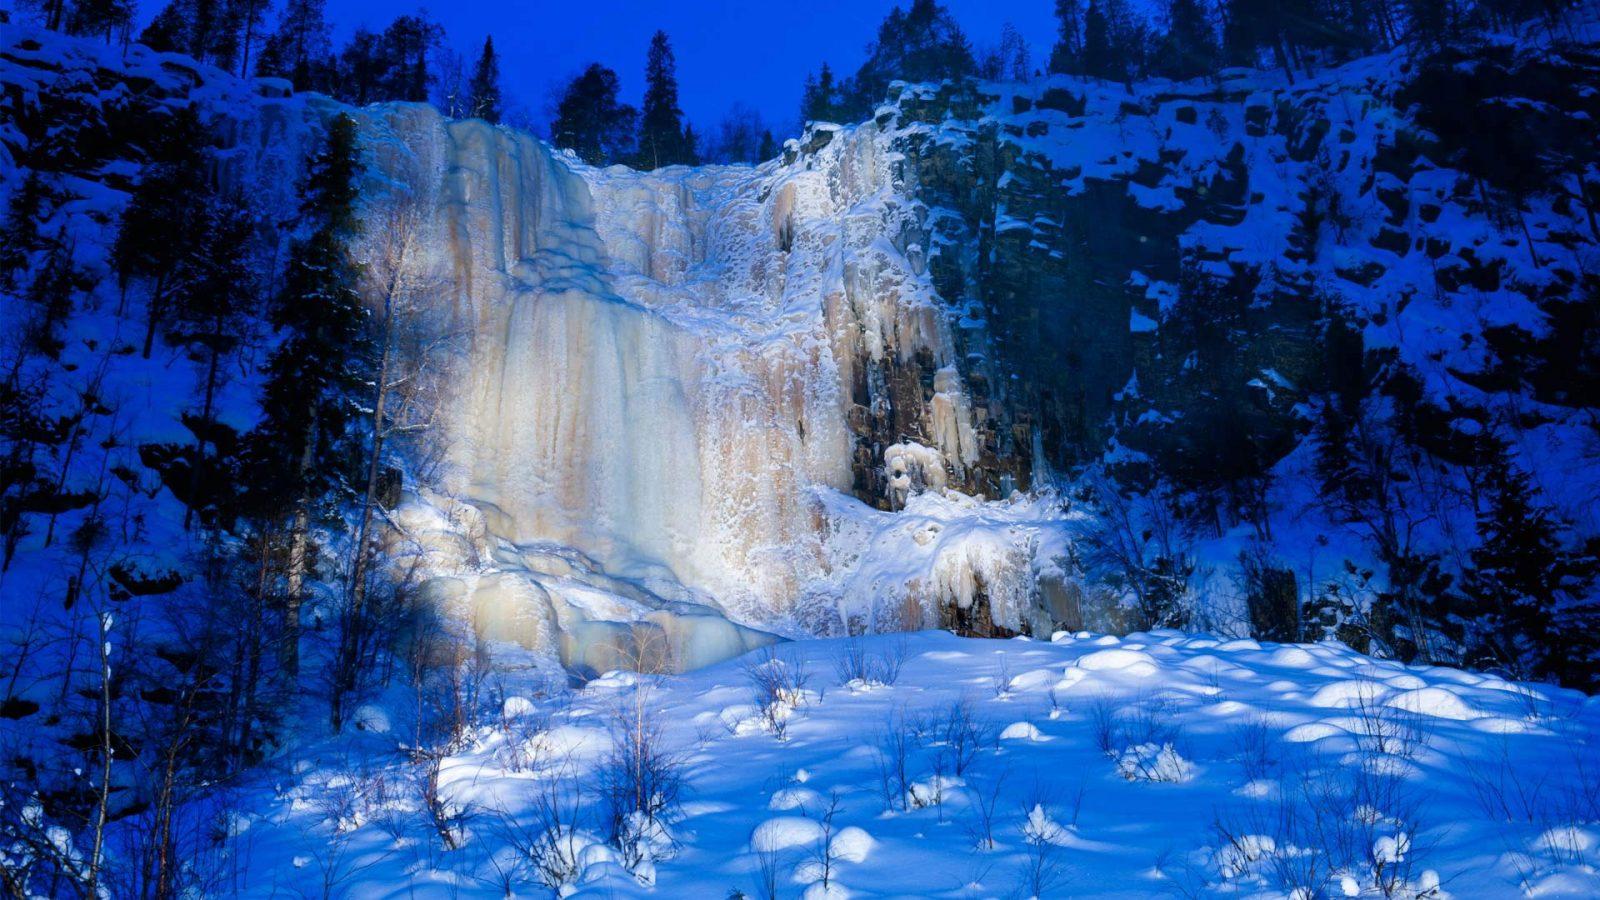 Frozen Waterfall – Bing Wallpaper Download